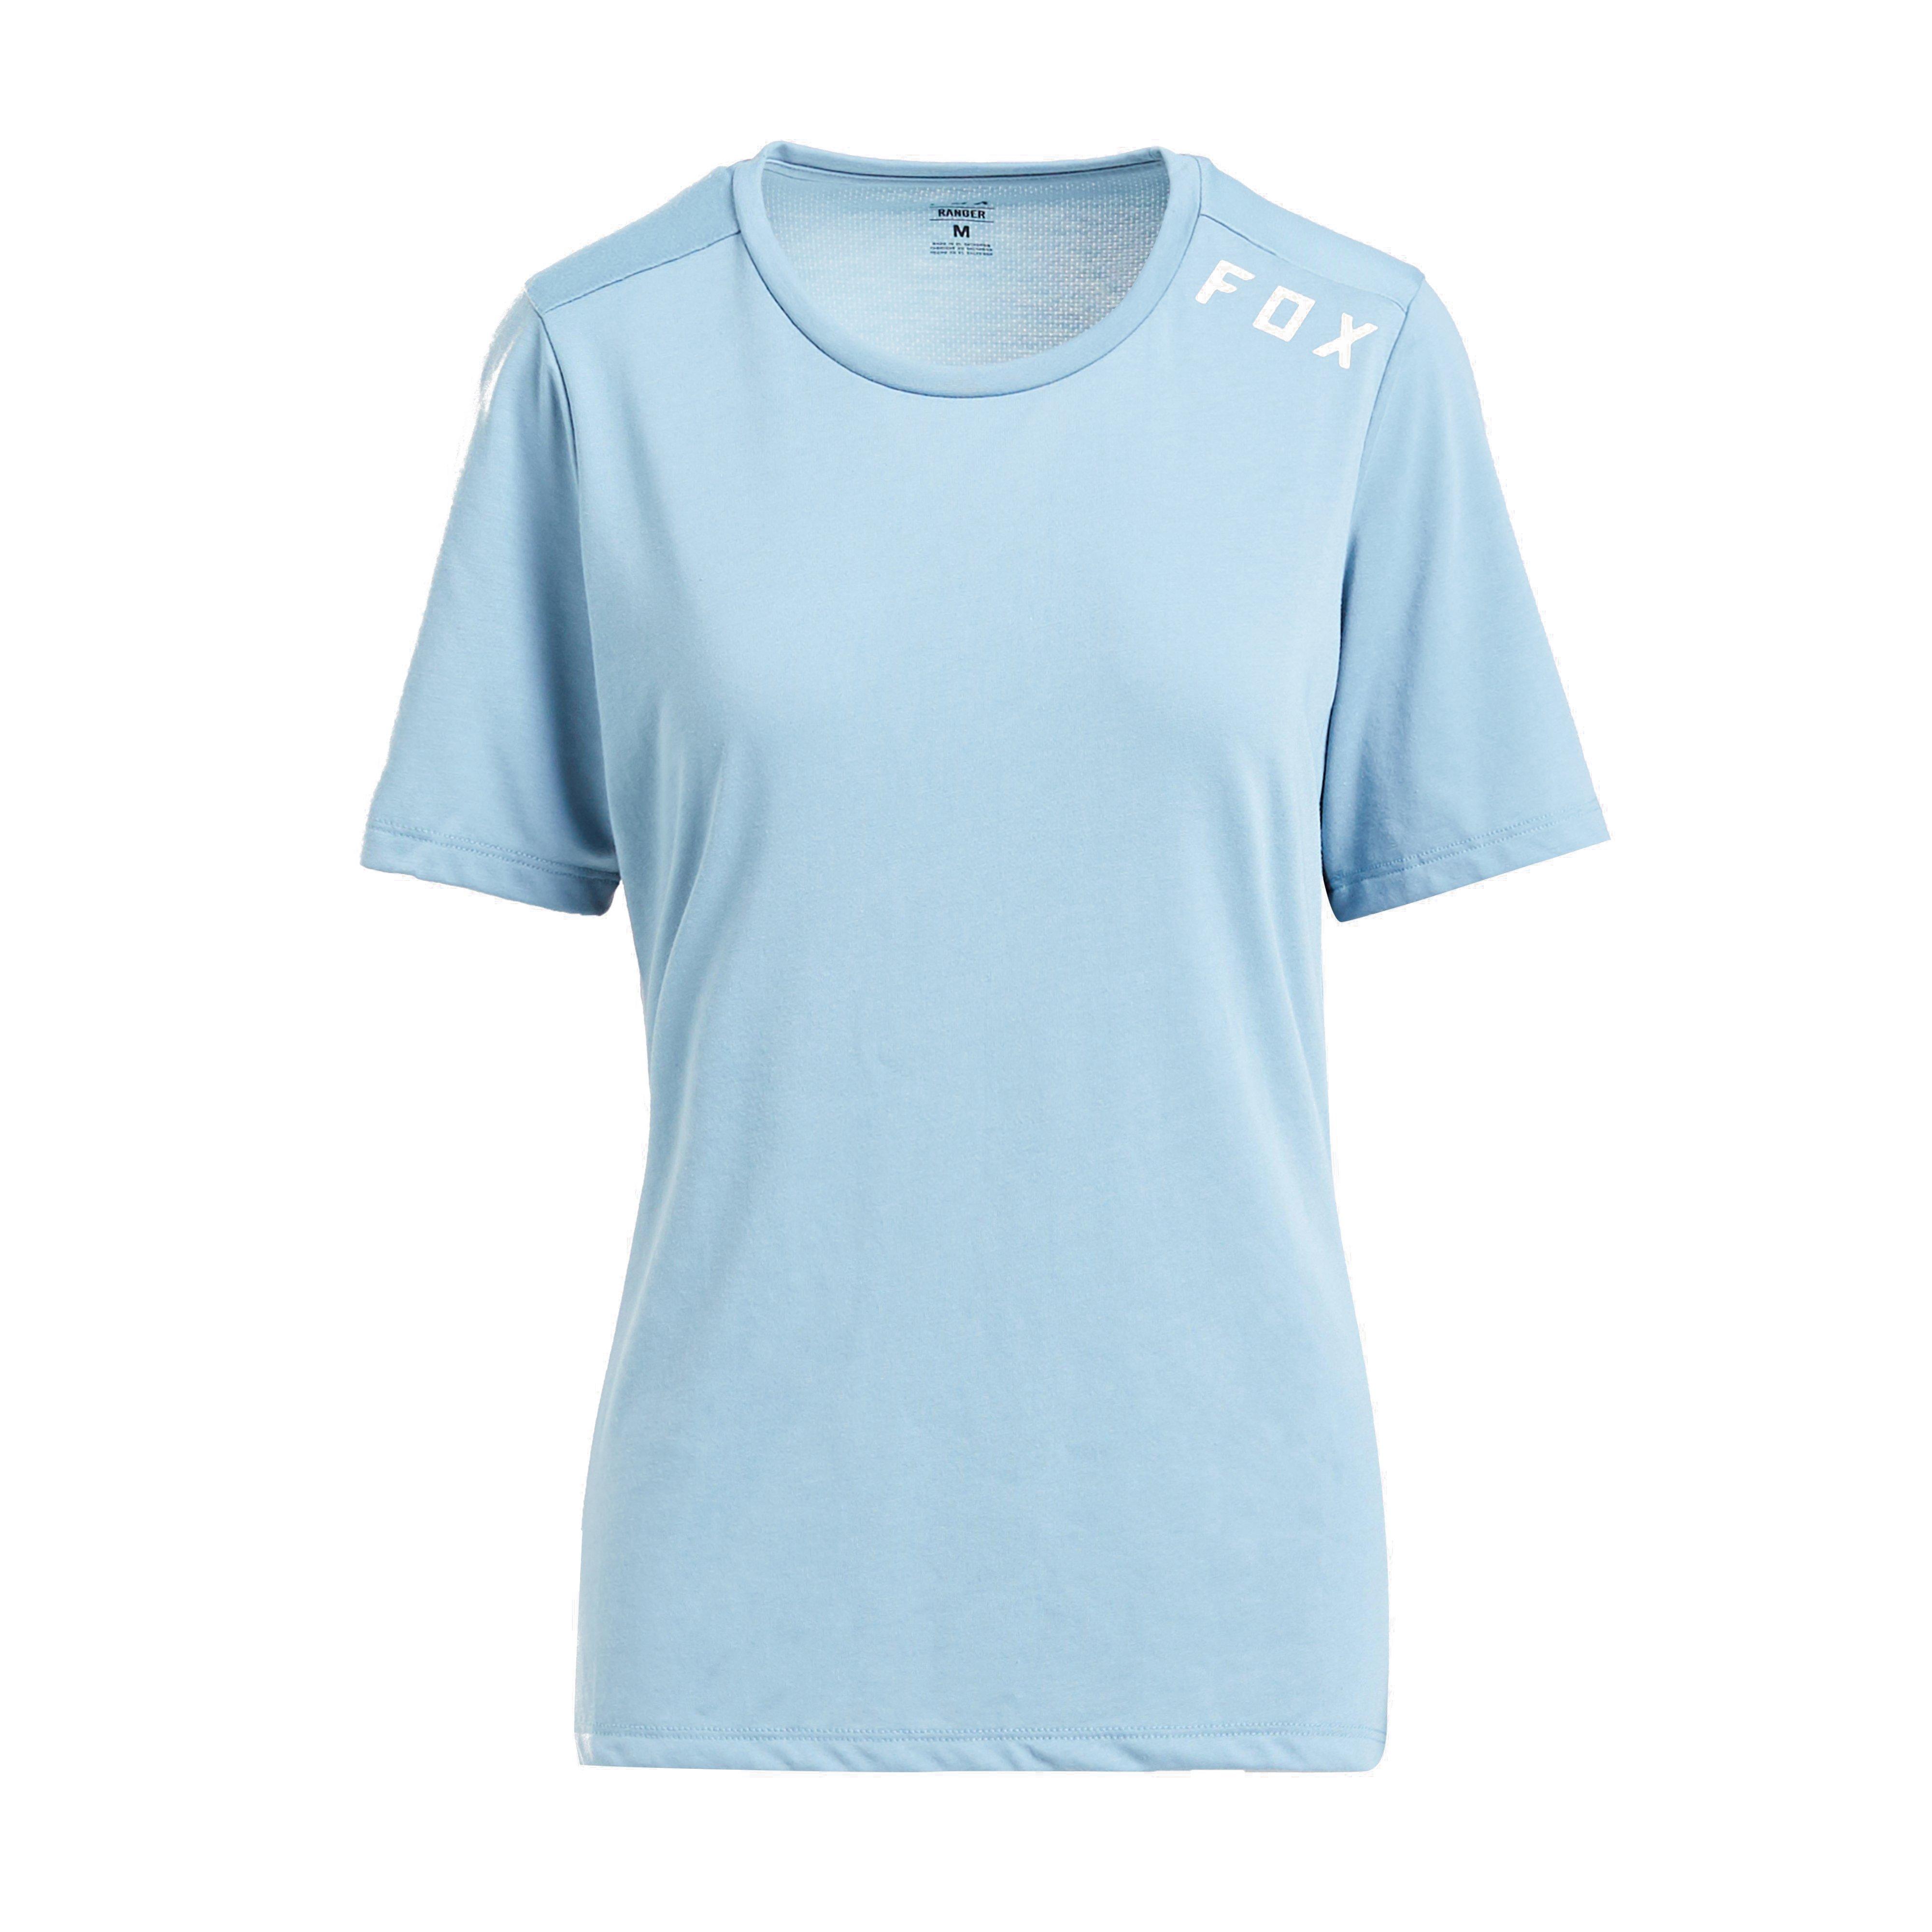 Fox Women's Ranger drirelease Short Sleeve Jersey, Blue